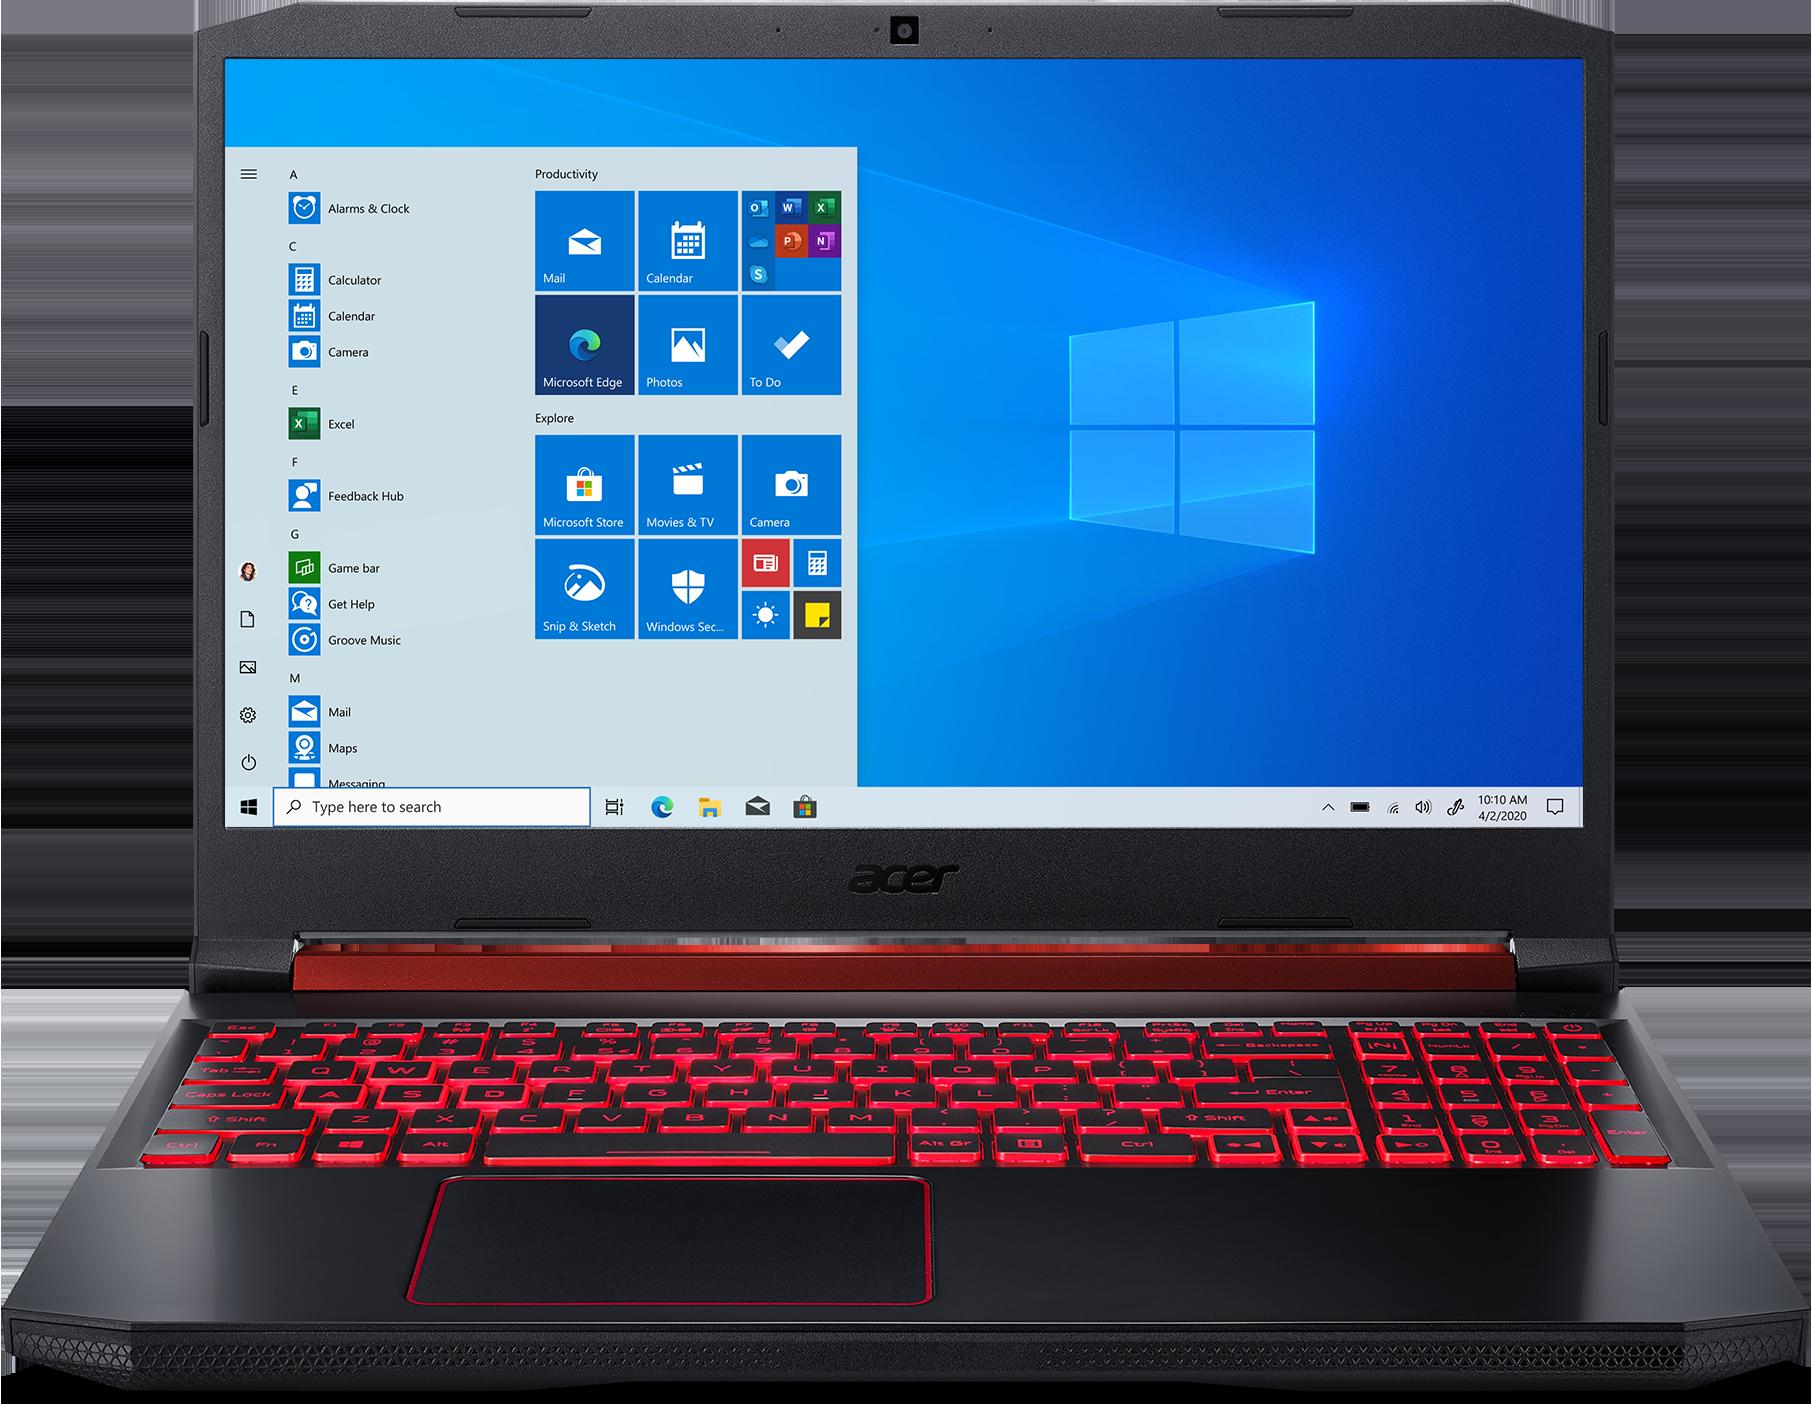 Acer Nitro 5 AN515-54-70KK Gaming Laptop 15.6-inch Full HD display Intel Core i7-9750H 16GB memory/512GB SSD NVIDIA GeForce RTX 2060